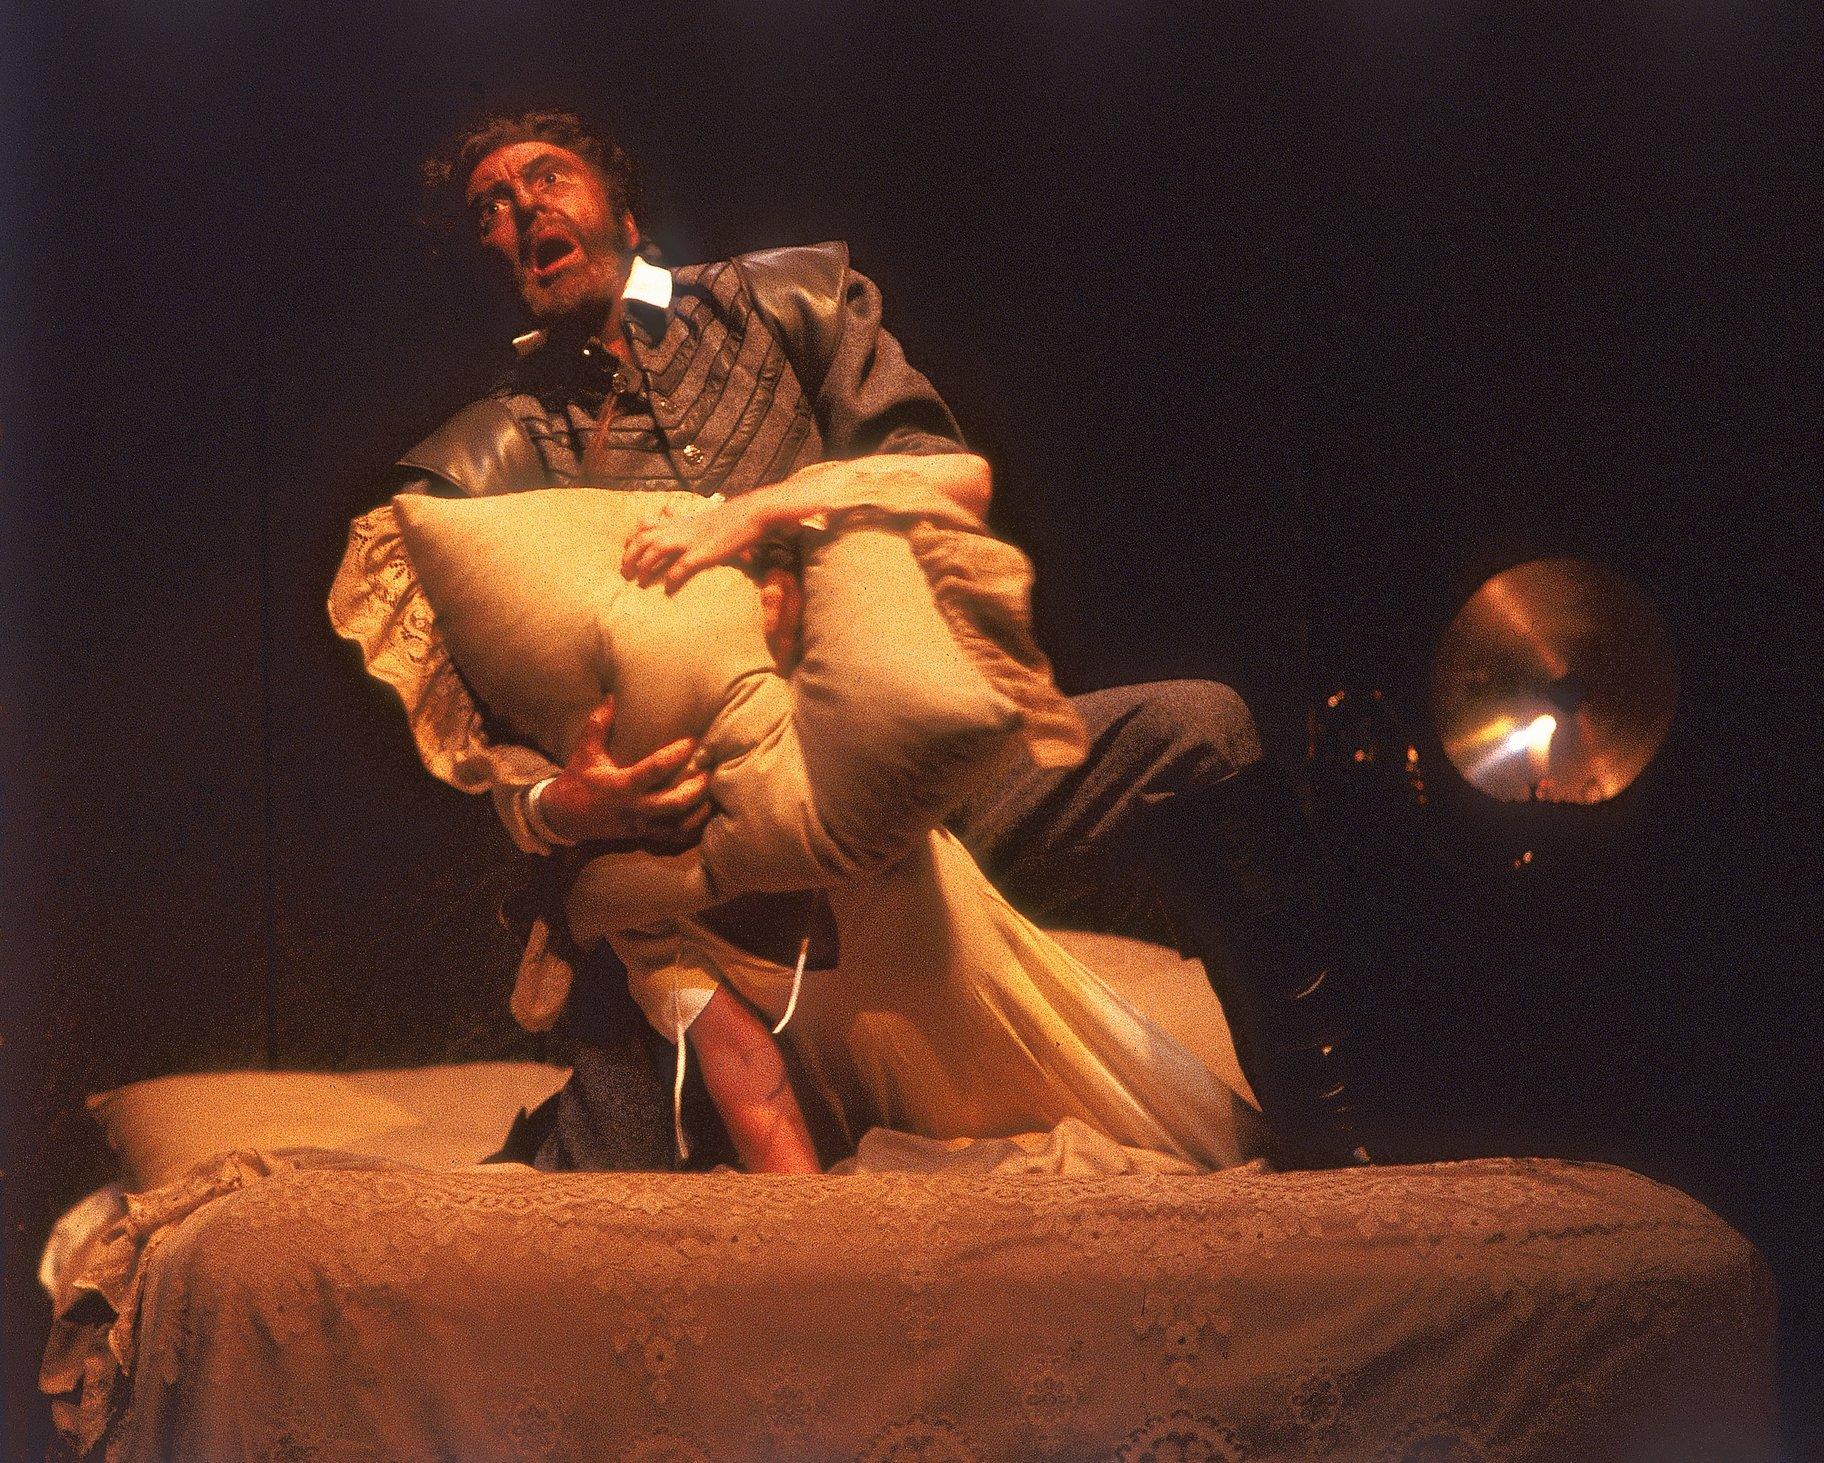 Othello suffocates Desdemona.